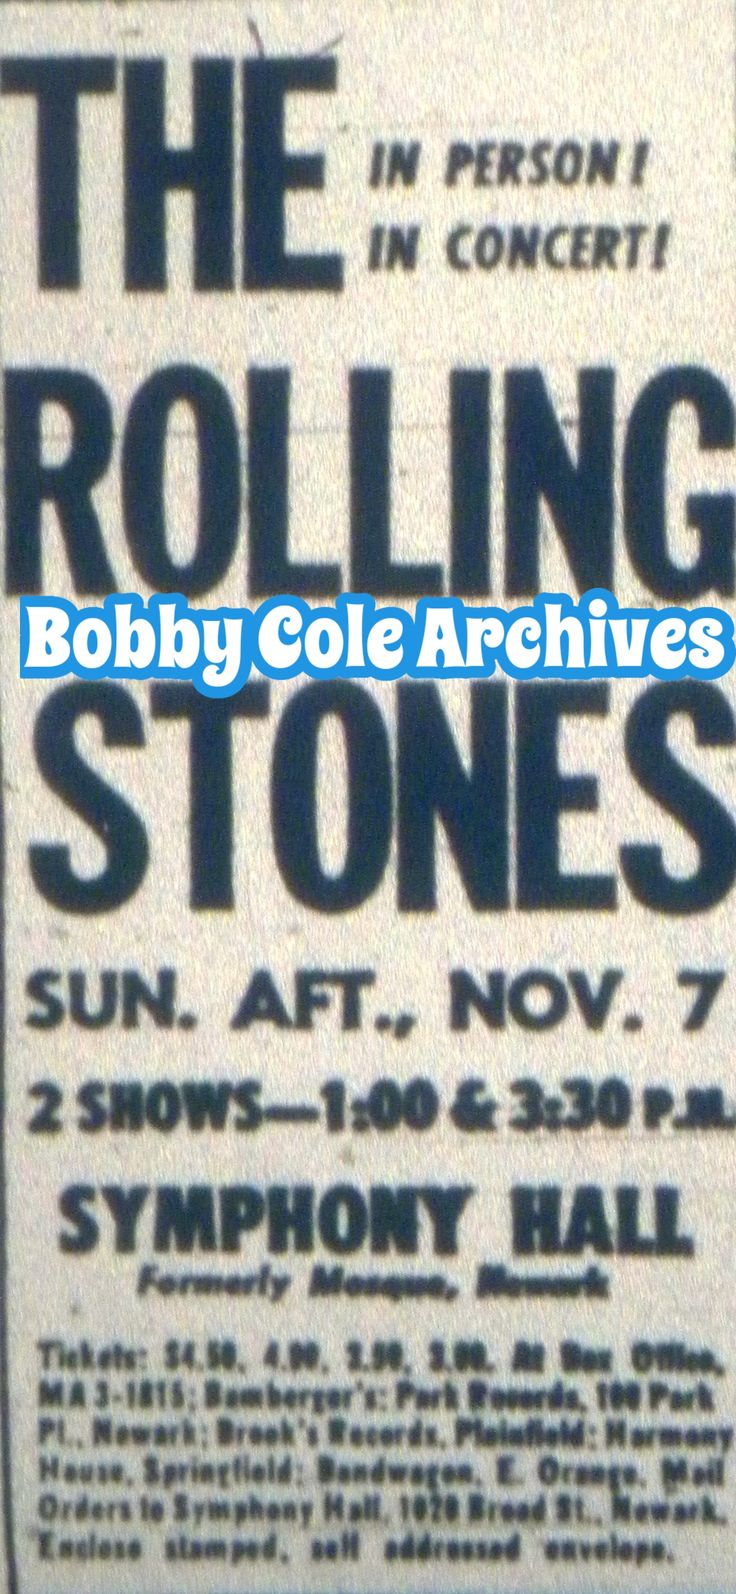 50 best vintage ads of newark nj images on pinterest vintage ads rolling stones at symphony hall 1965 aiddatafo Image collections